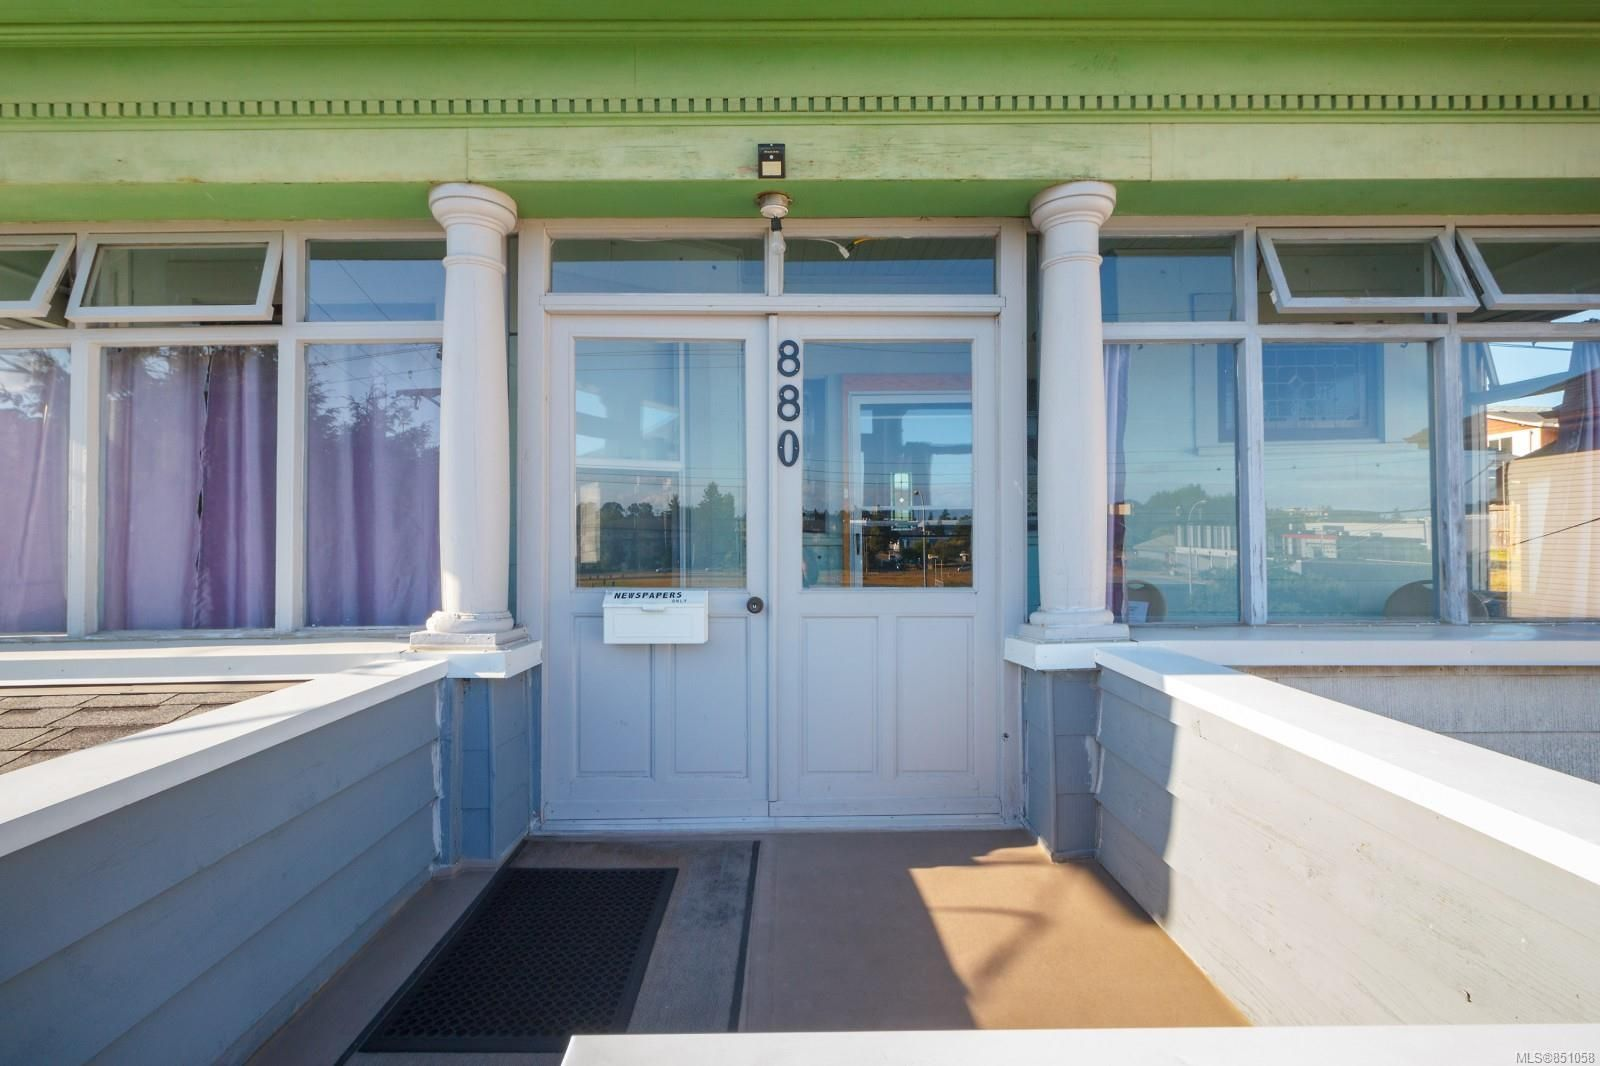 Main Photo: 880 Colville Rd in : Es Old Esquimalt House for sale (Esquimalt)  : MLS®# 851058